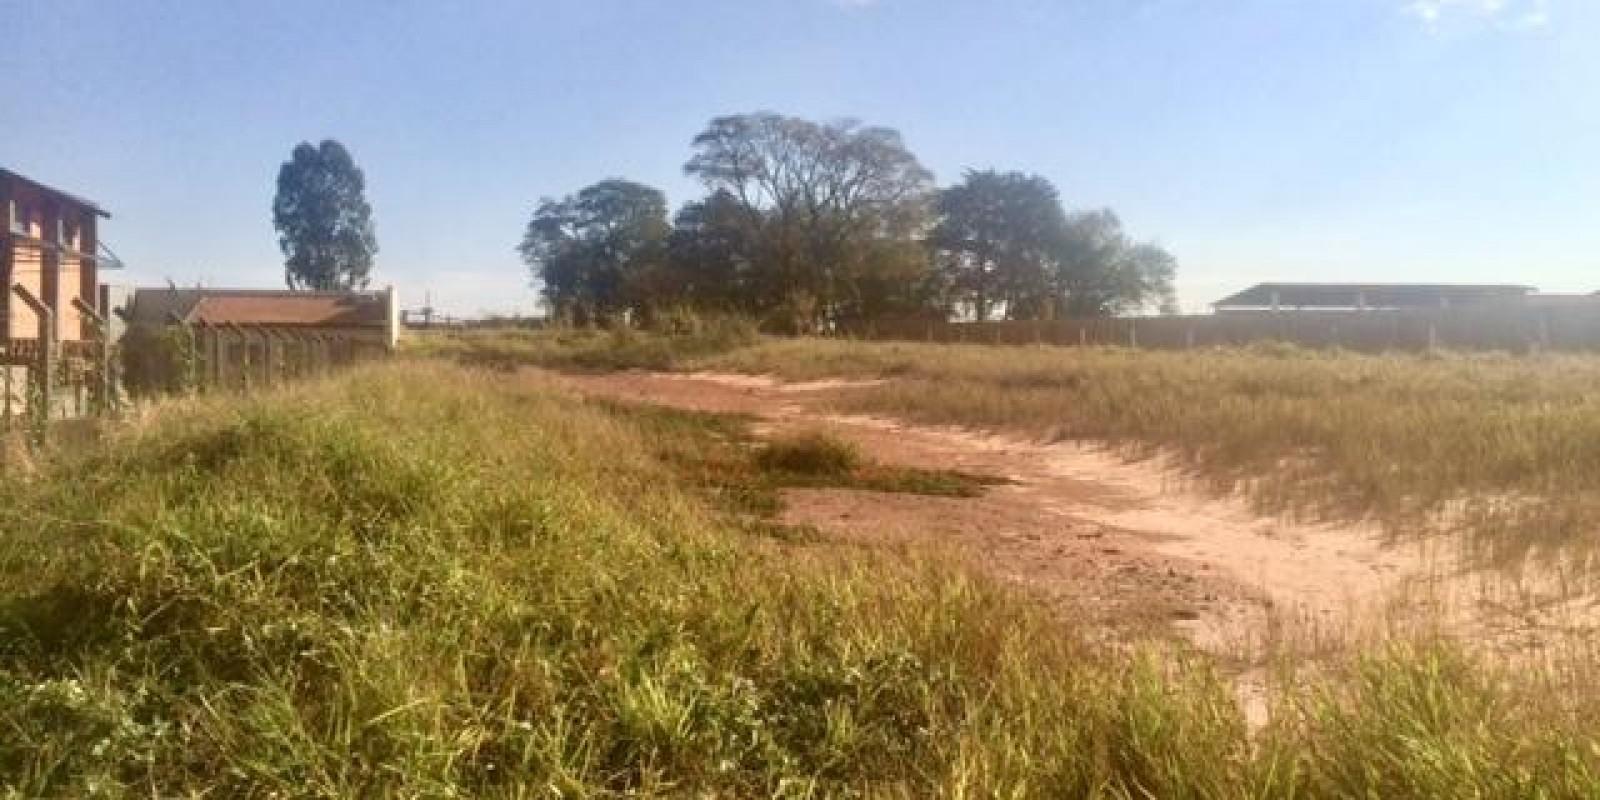 Terreno na rodovia SP 255 - Foto 3 de 5